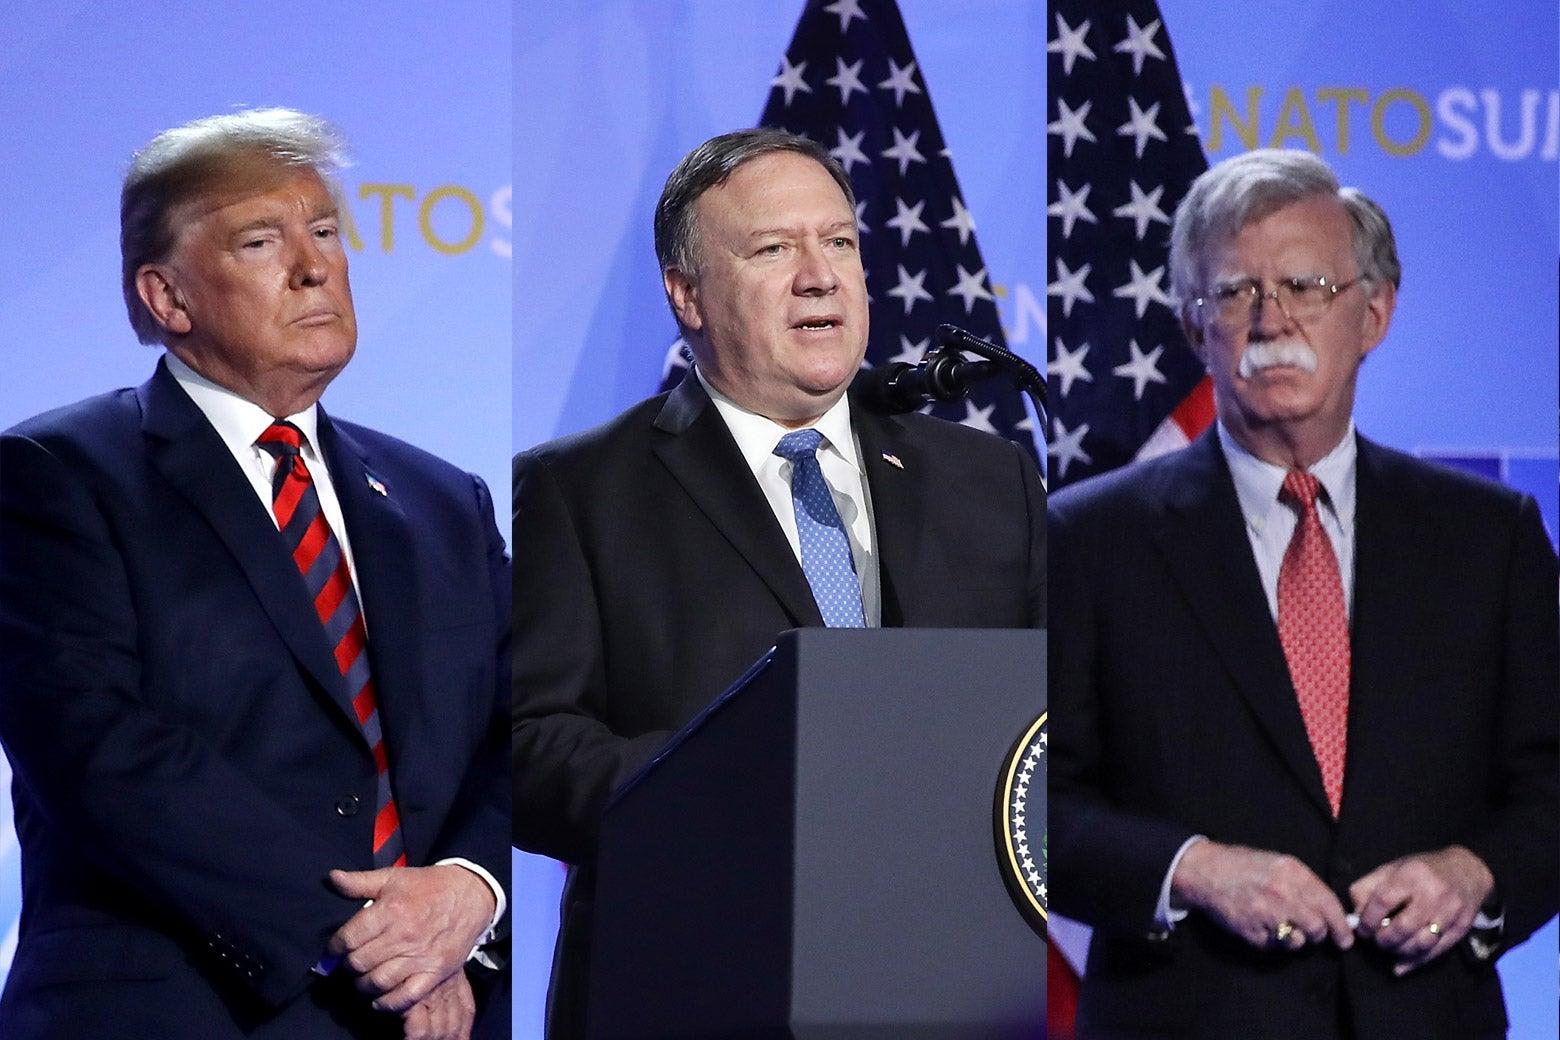 Donald Trump, Mike Pompeo, and John Bolton.